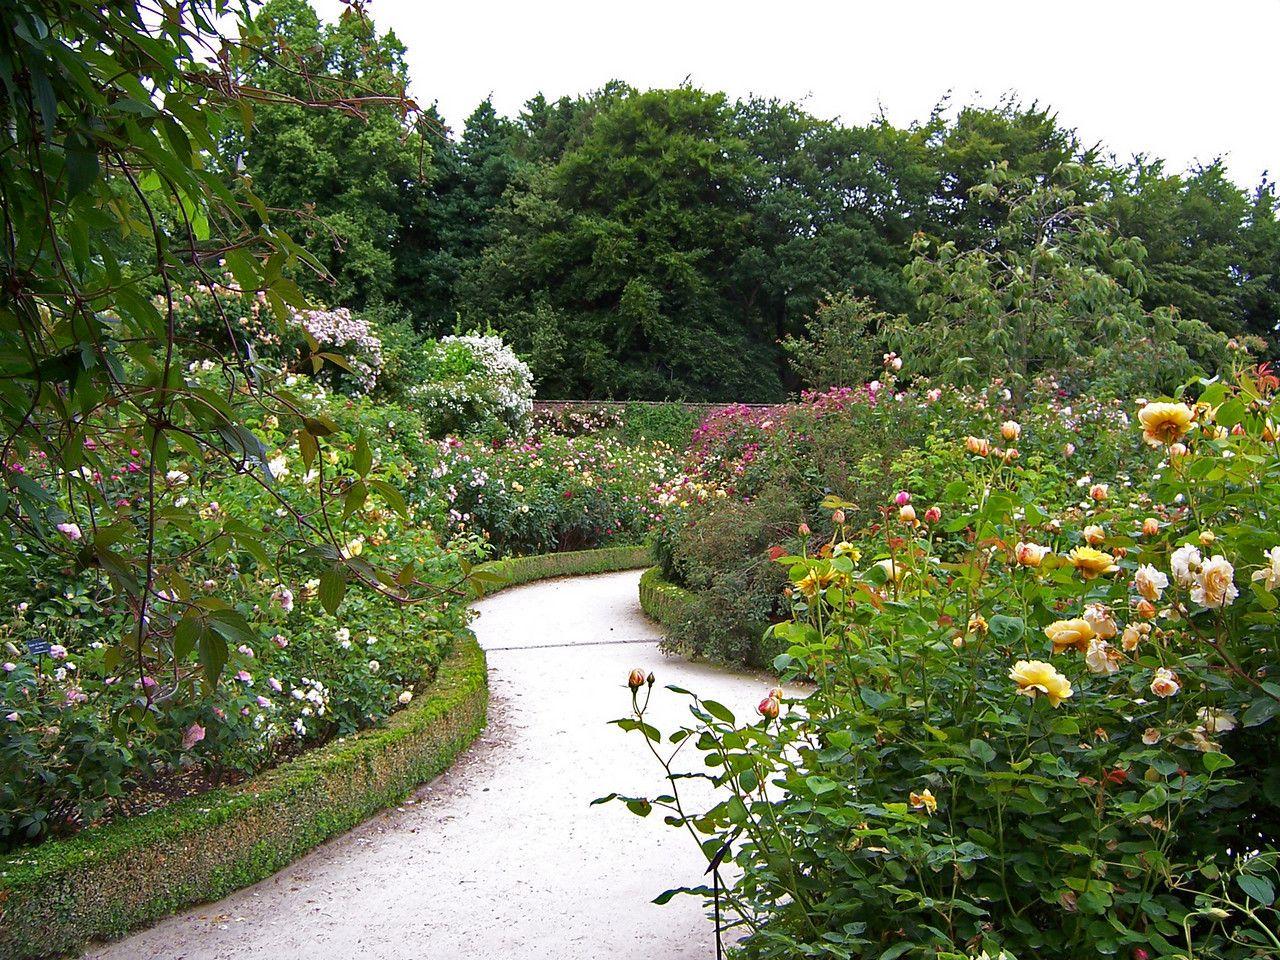 Peter Wirtz Gardens Chicagobotanicgarden Outdoor Gardens Castle Garden Garden Buildings